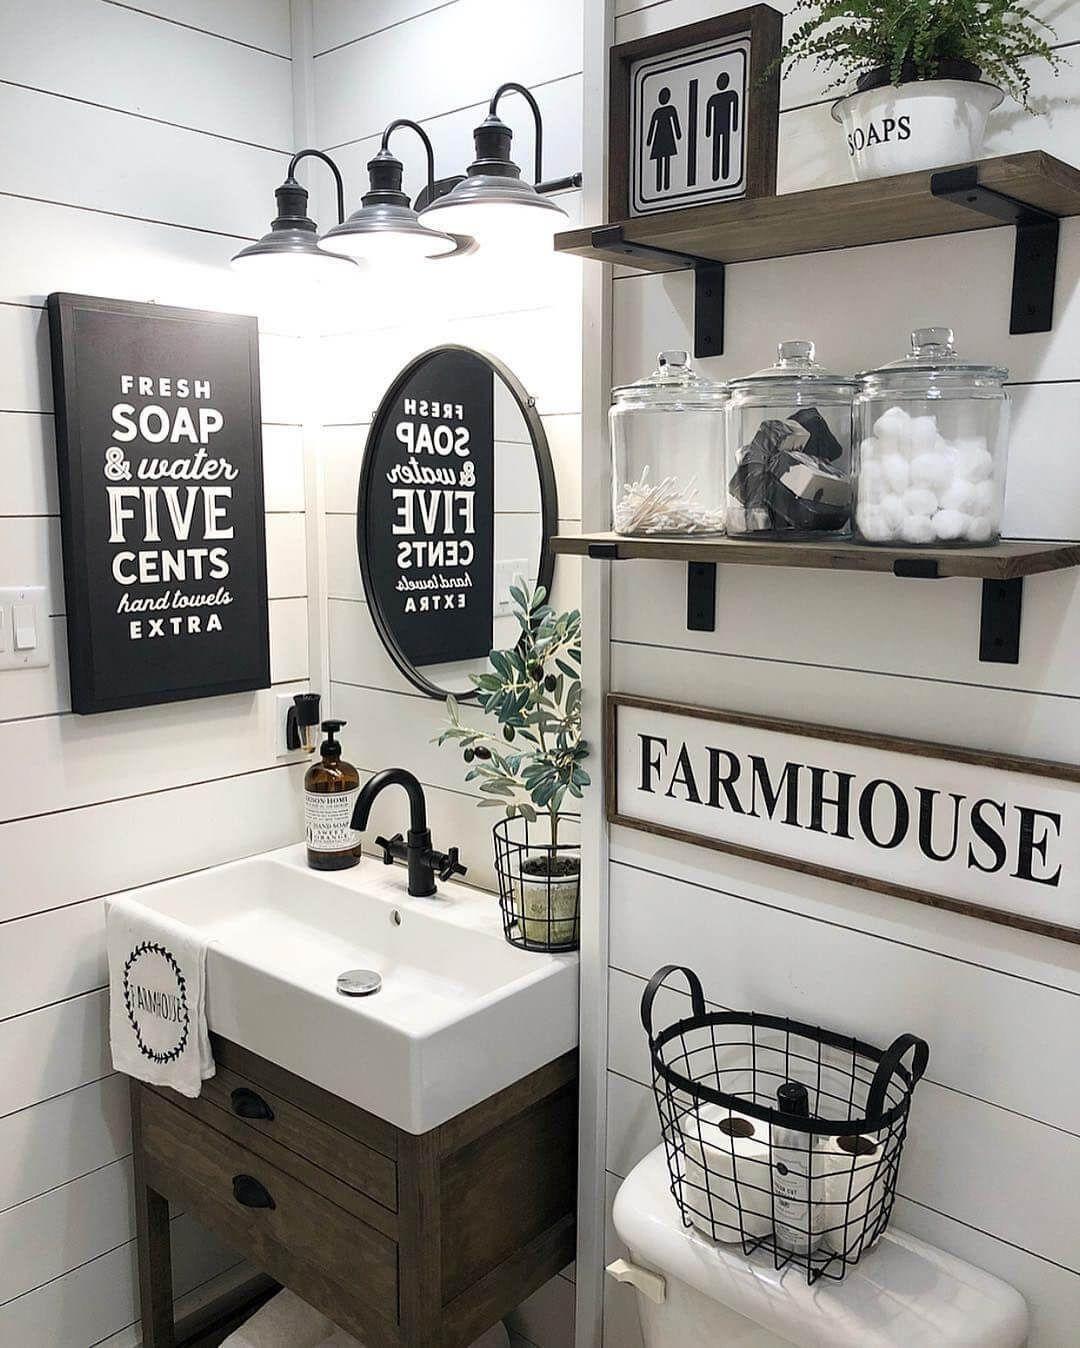 25 Stunning Shabby Chic Bathroom Designs That Will Adore You - 22D9F9Ff0236Ca88B8020C9C5B8945Bd